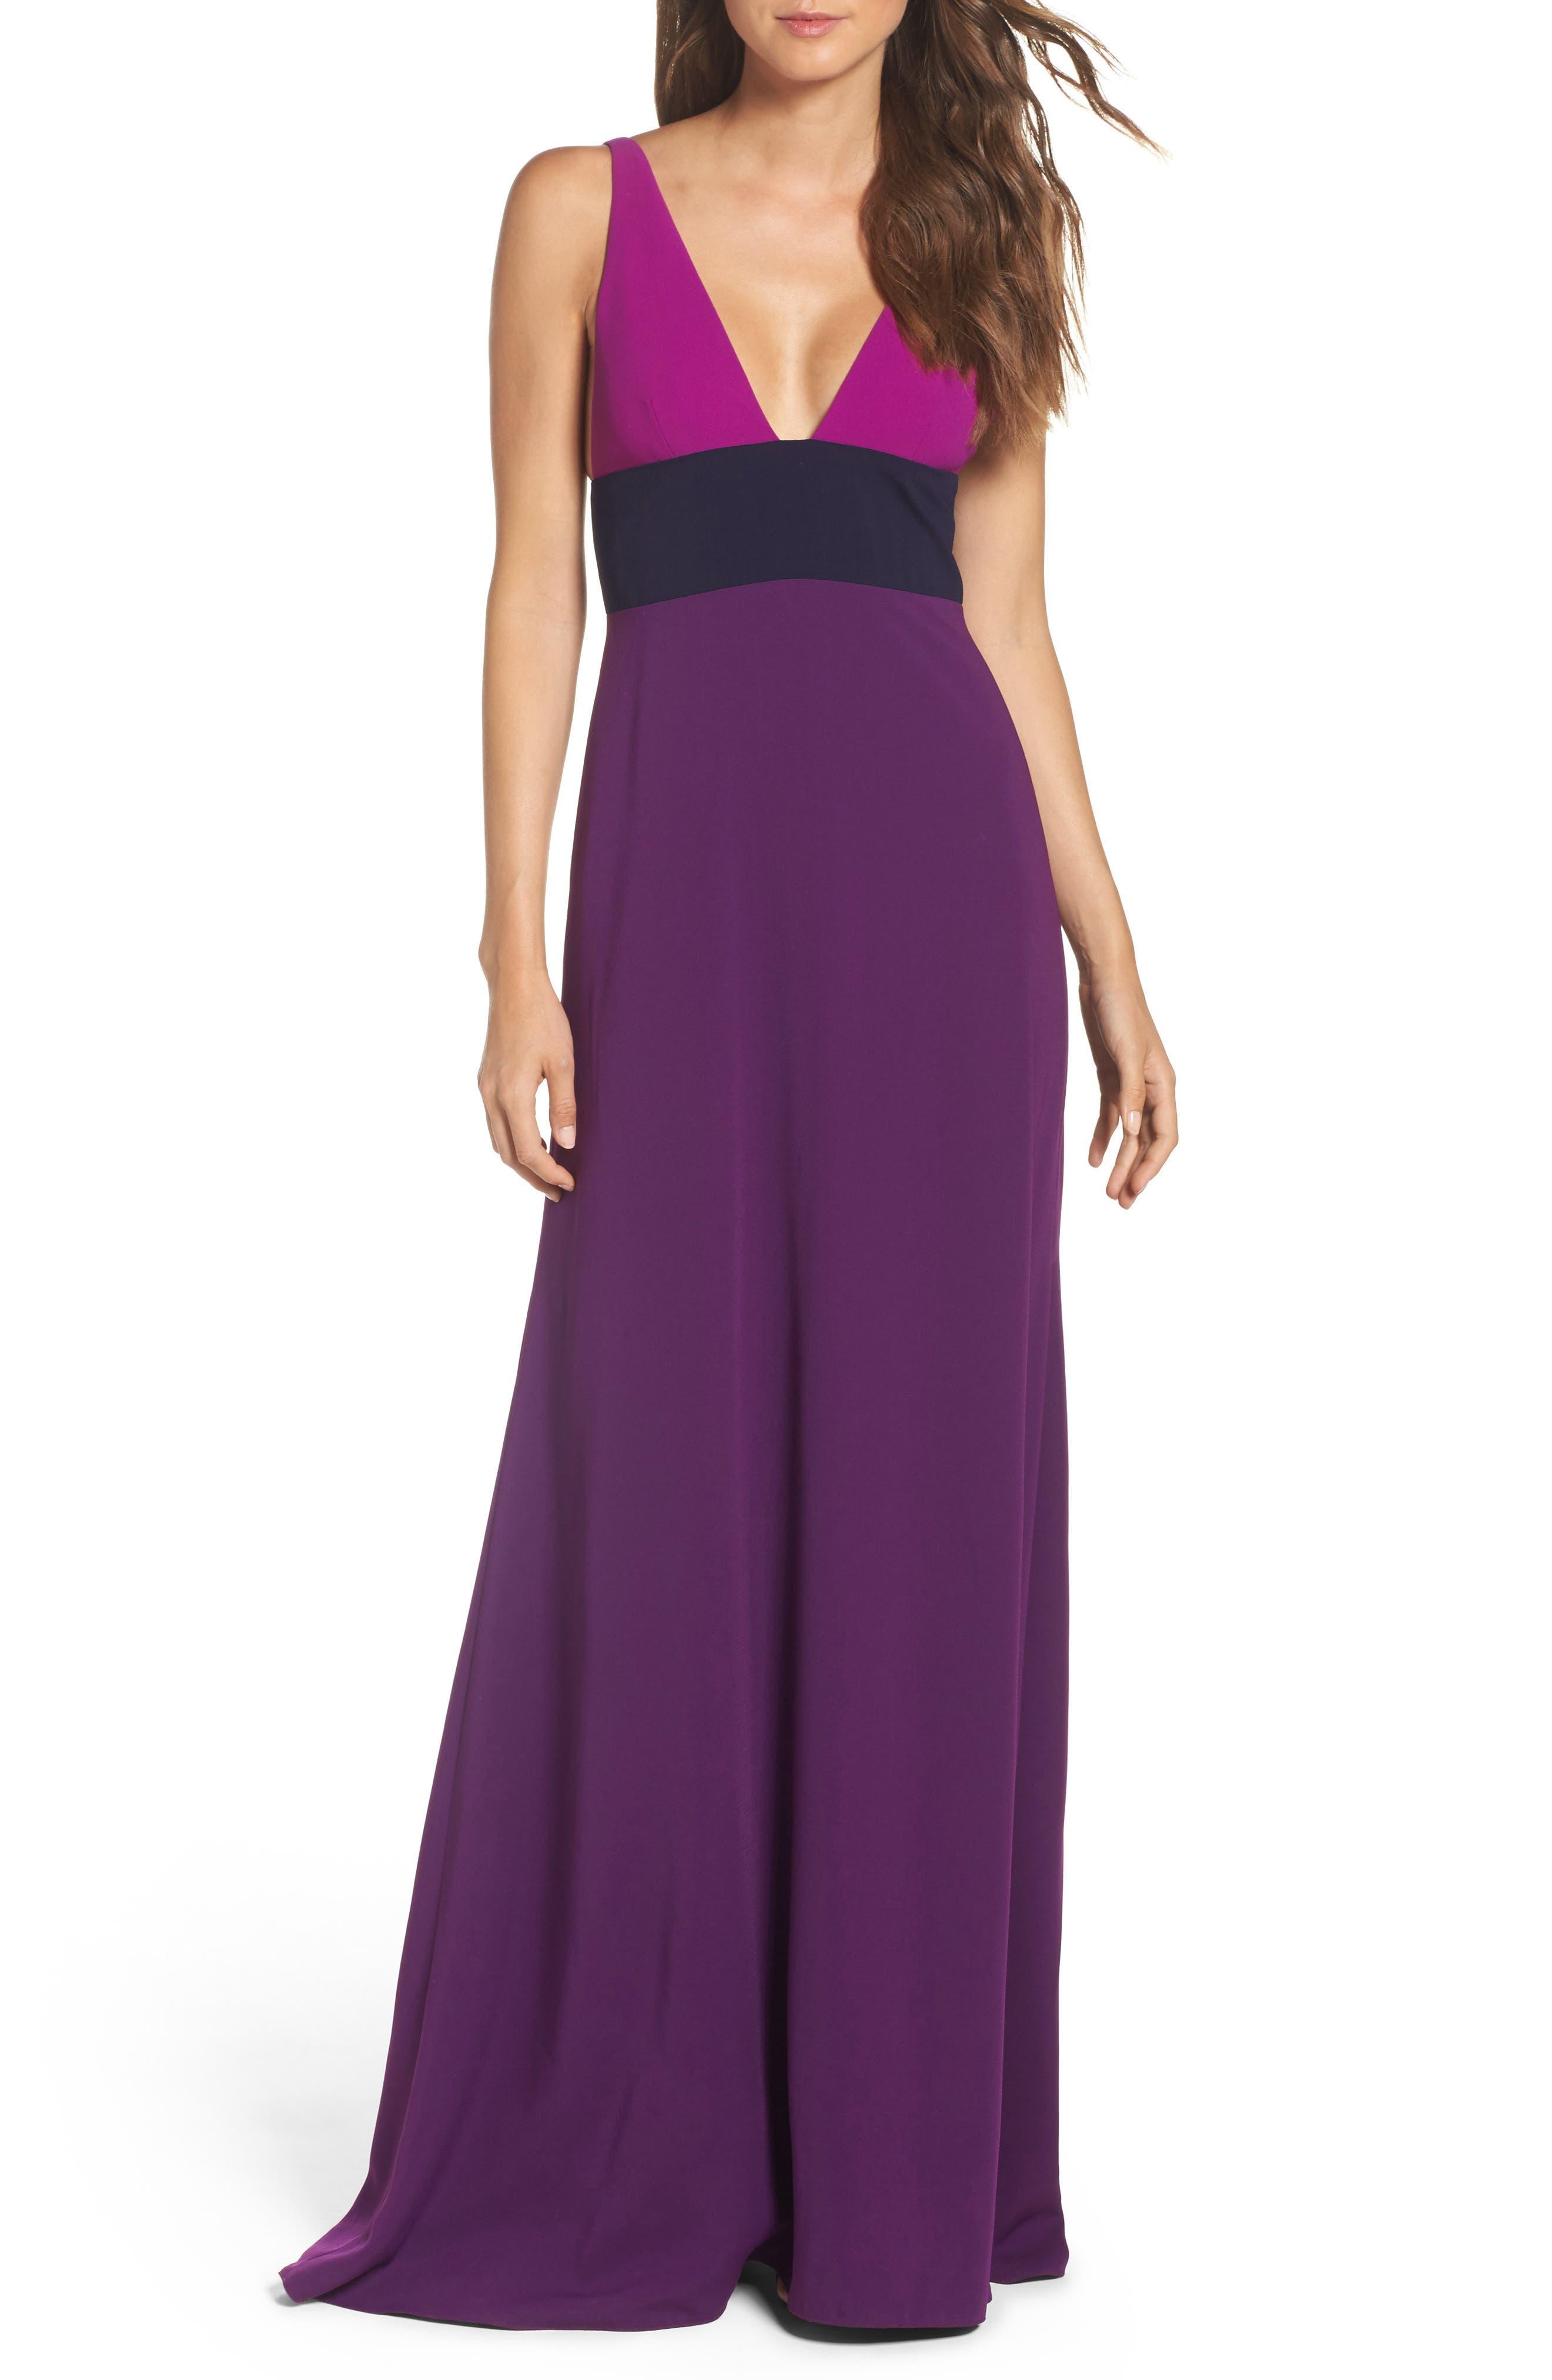 Jill Jill Stuart Colorblock V-Neck Gown